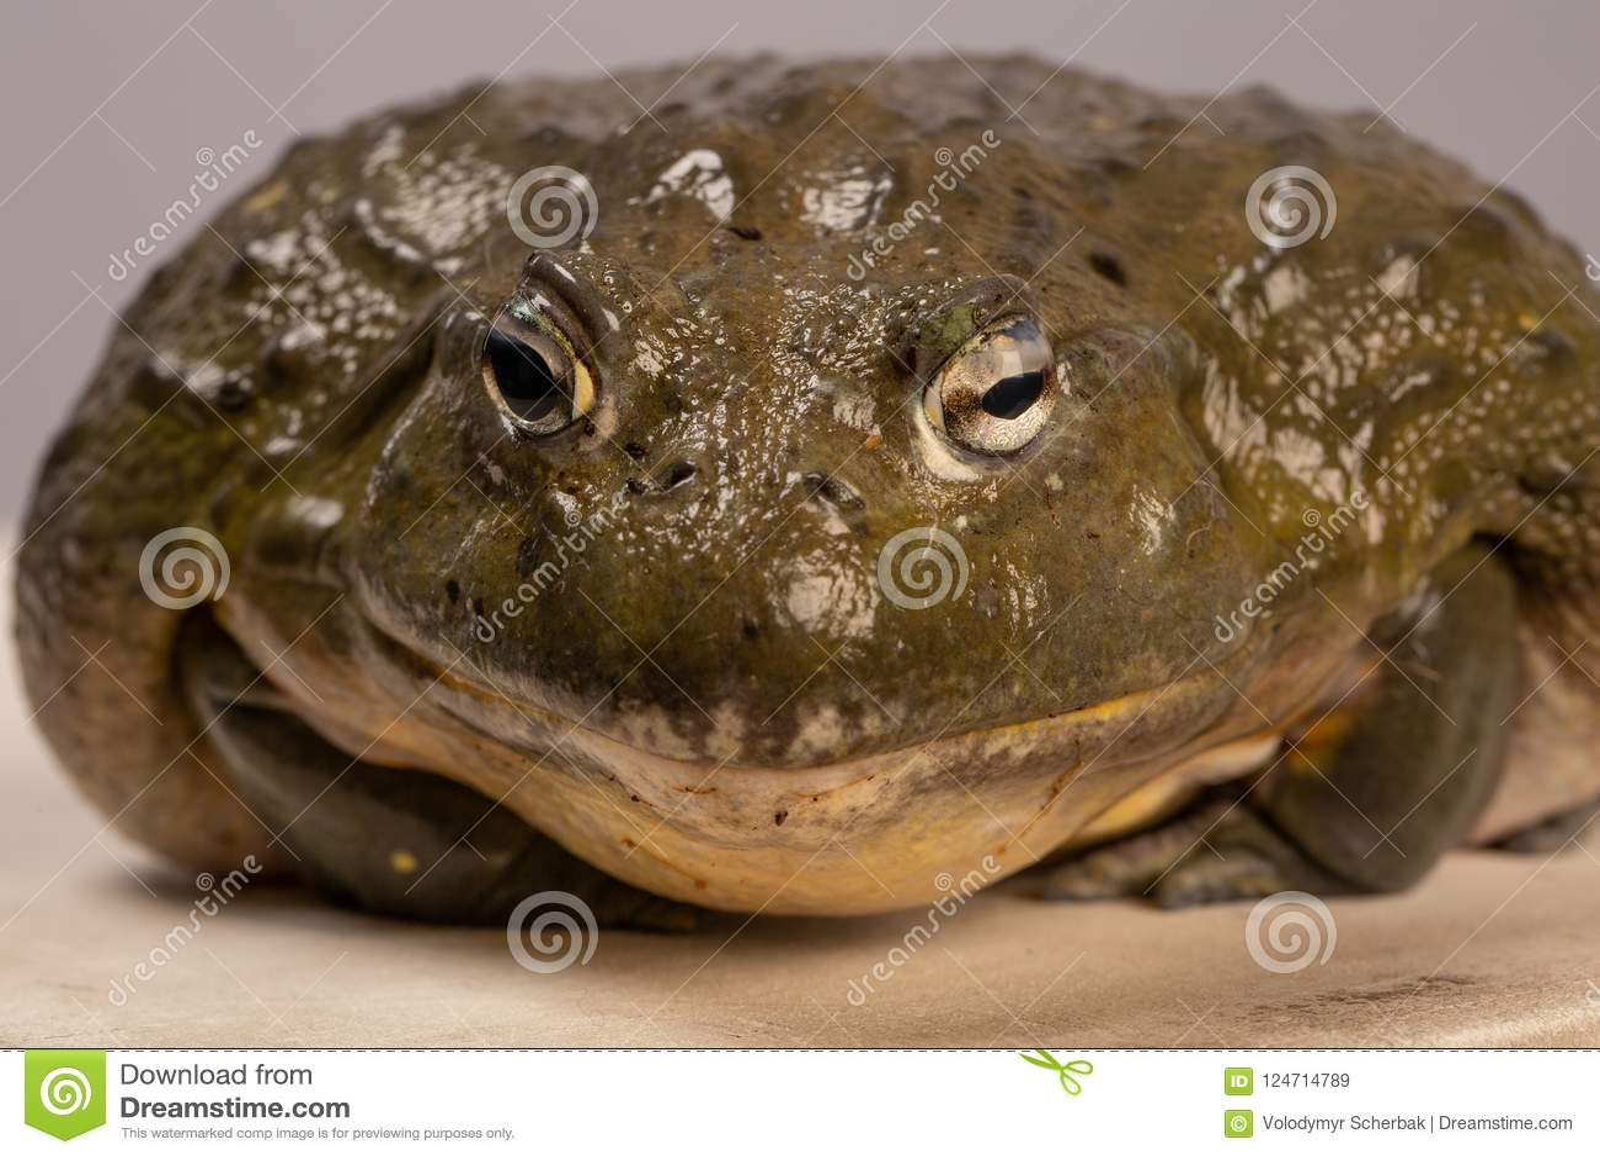 The portrait of African bullfrog. Macro. Toad